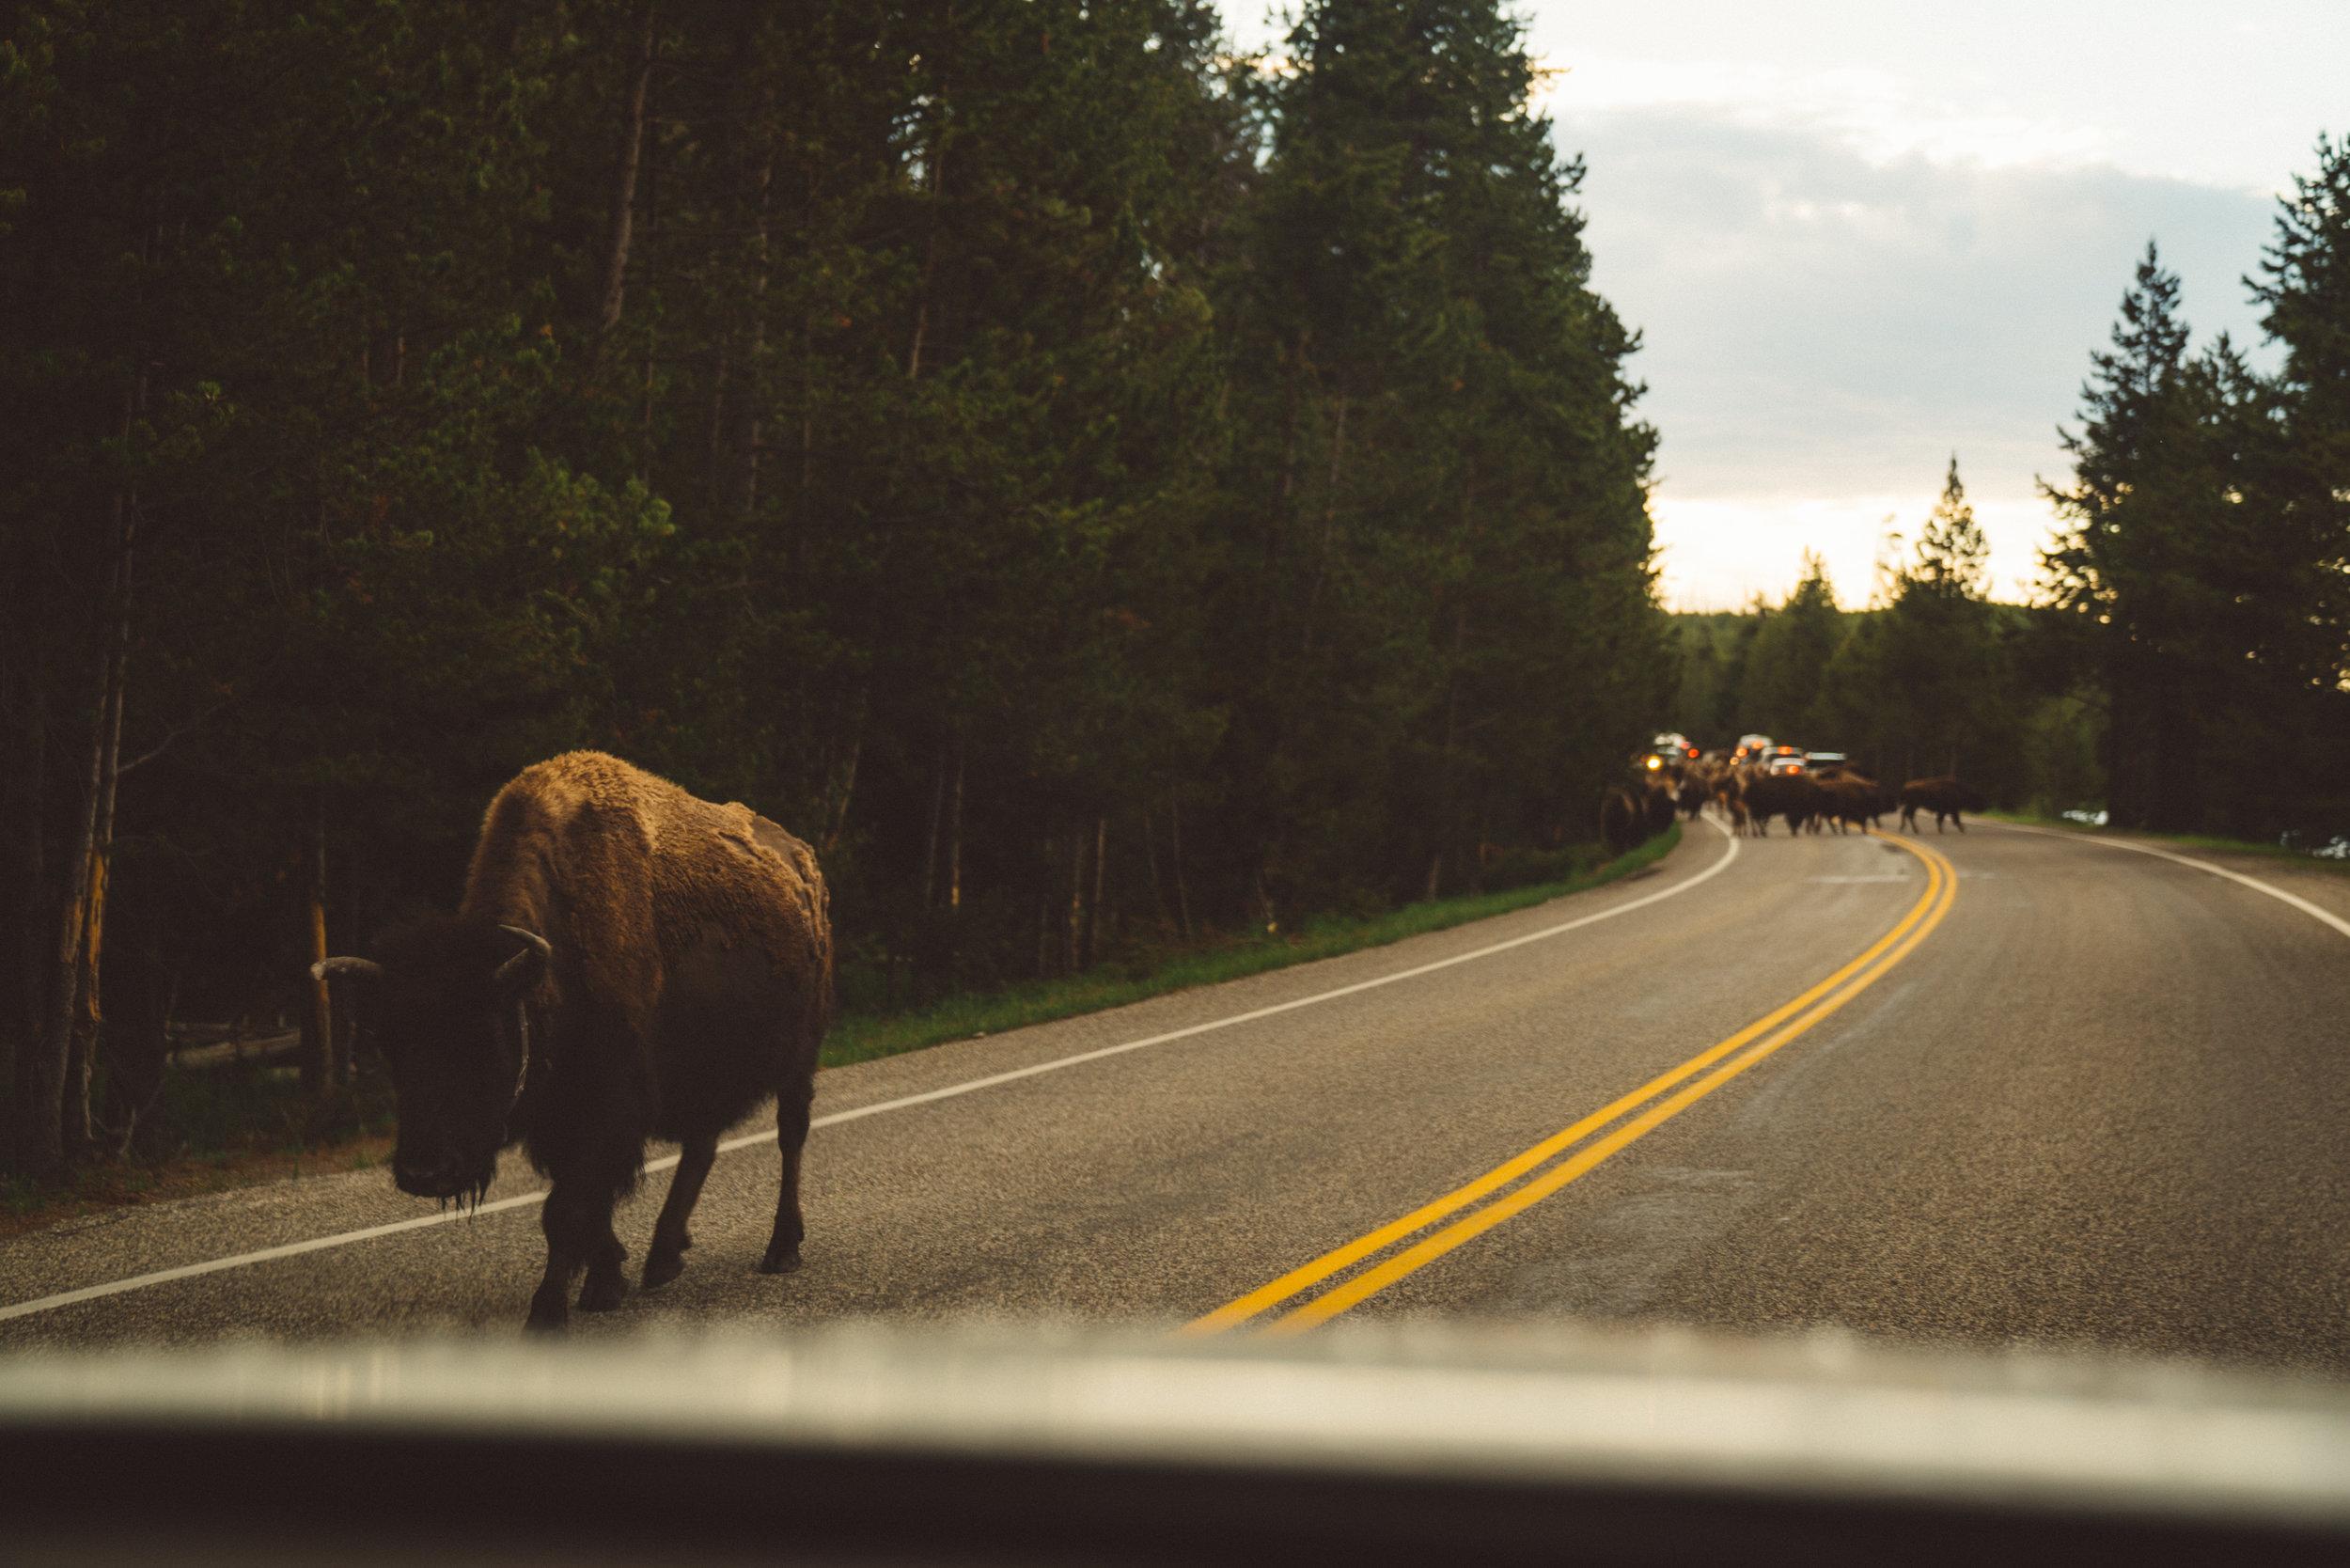 The traffic jam begins.